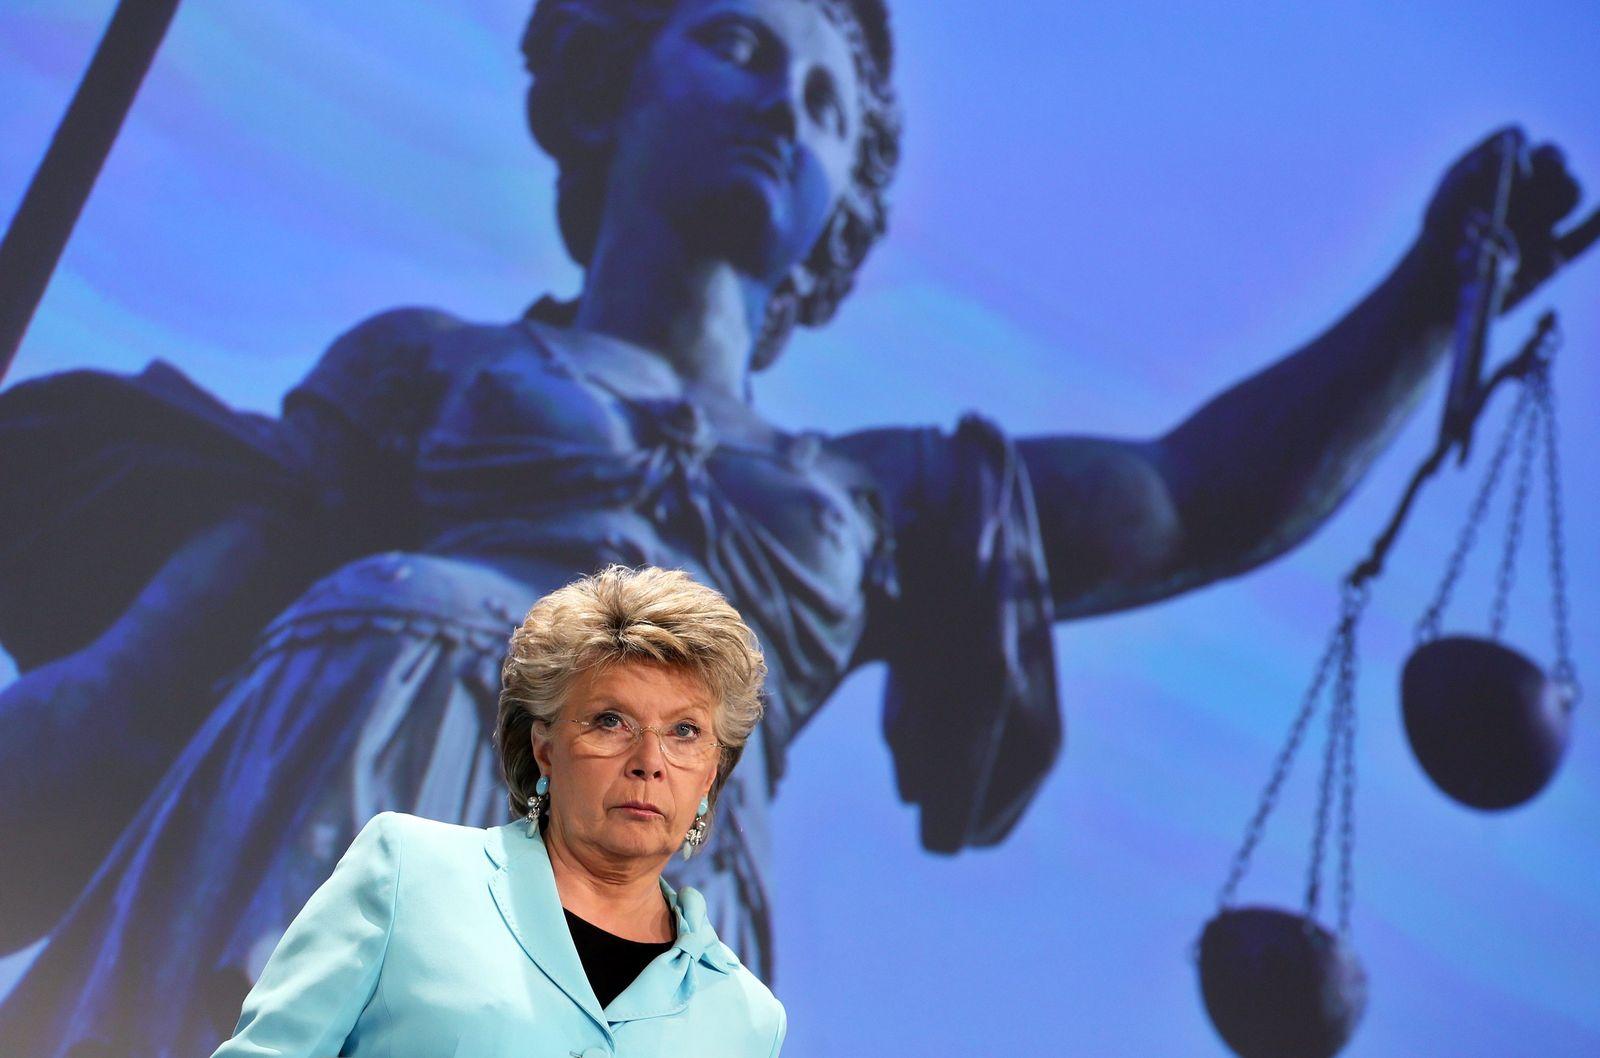 Viviane Reding press conference